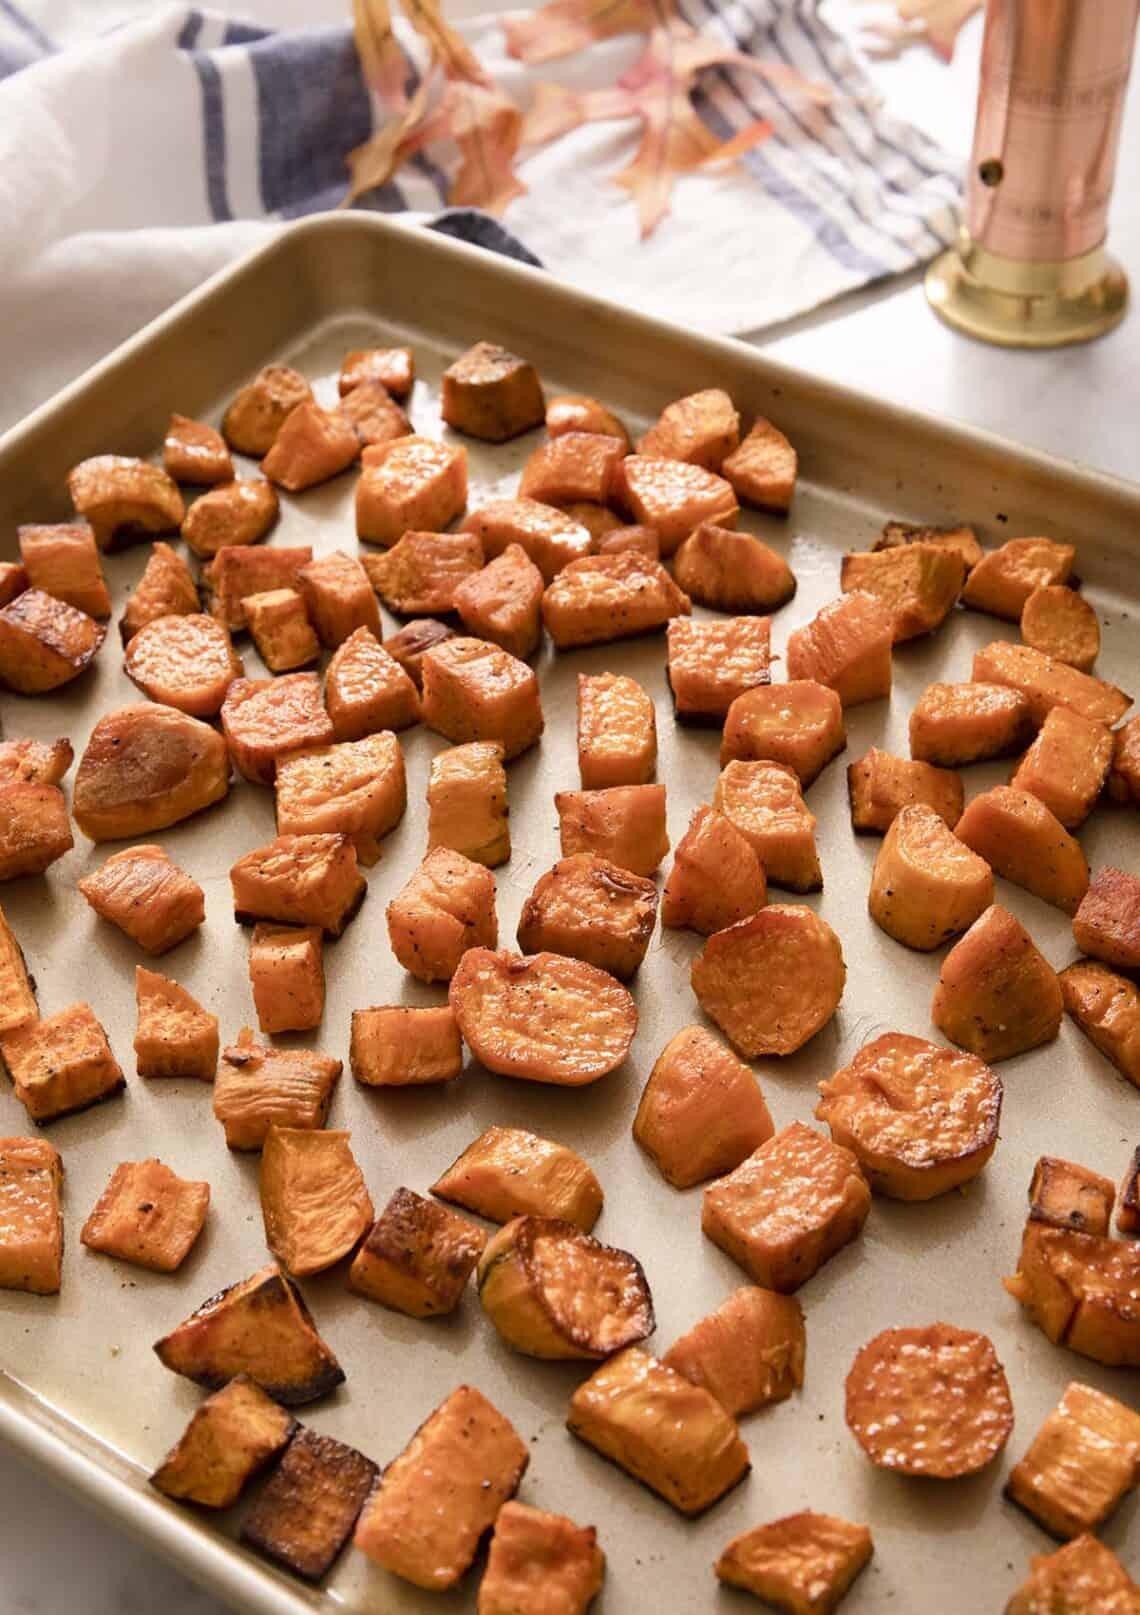 Roasted sweet potatoes on a golden baking sheet.